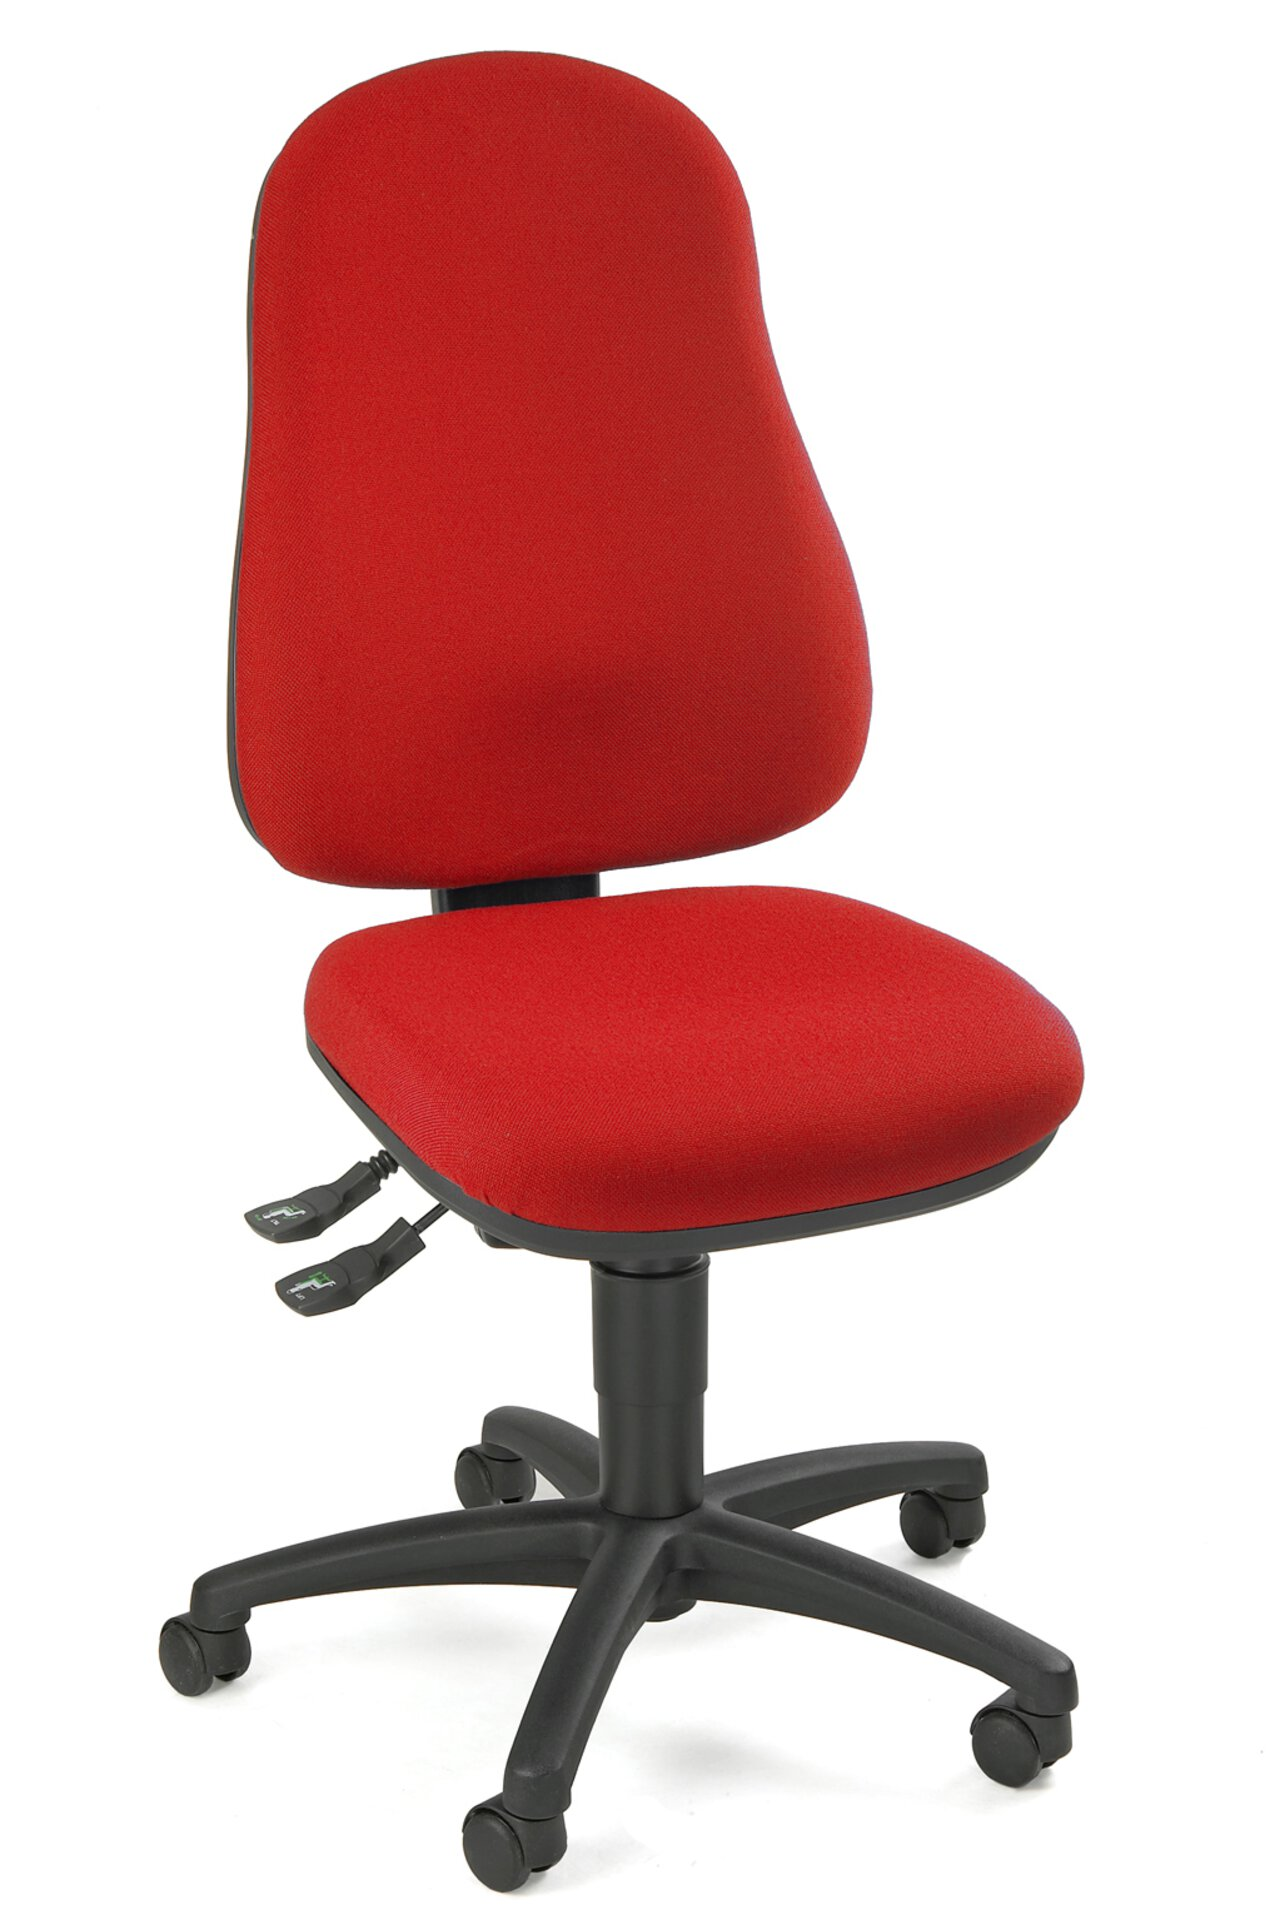 Büro-Drehstuhl POINT 60 Topstar Textil rot 48 x 109 x 46 cm